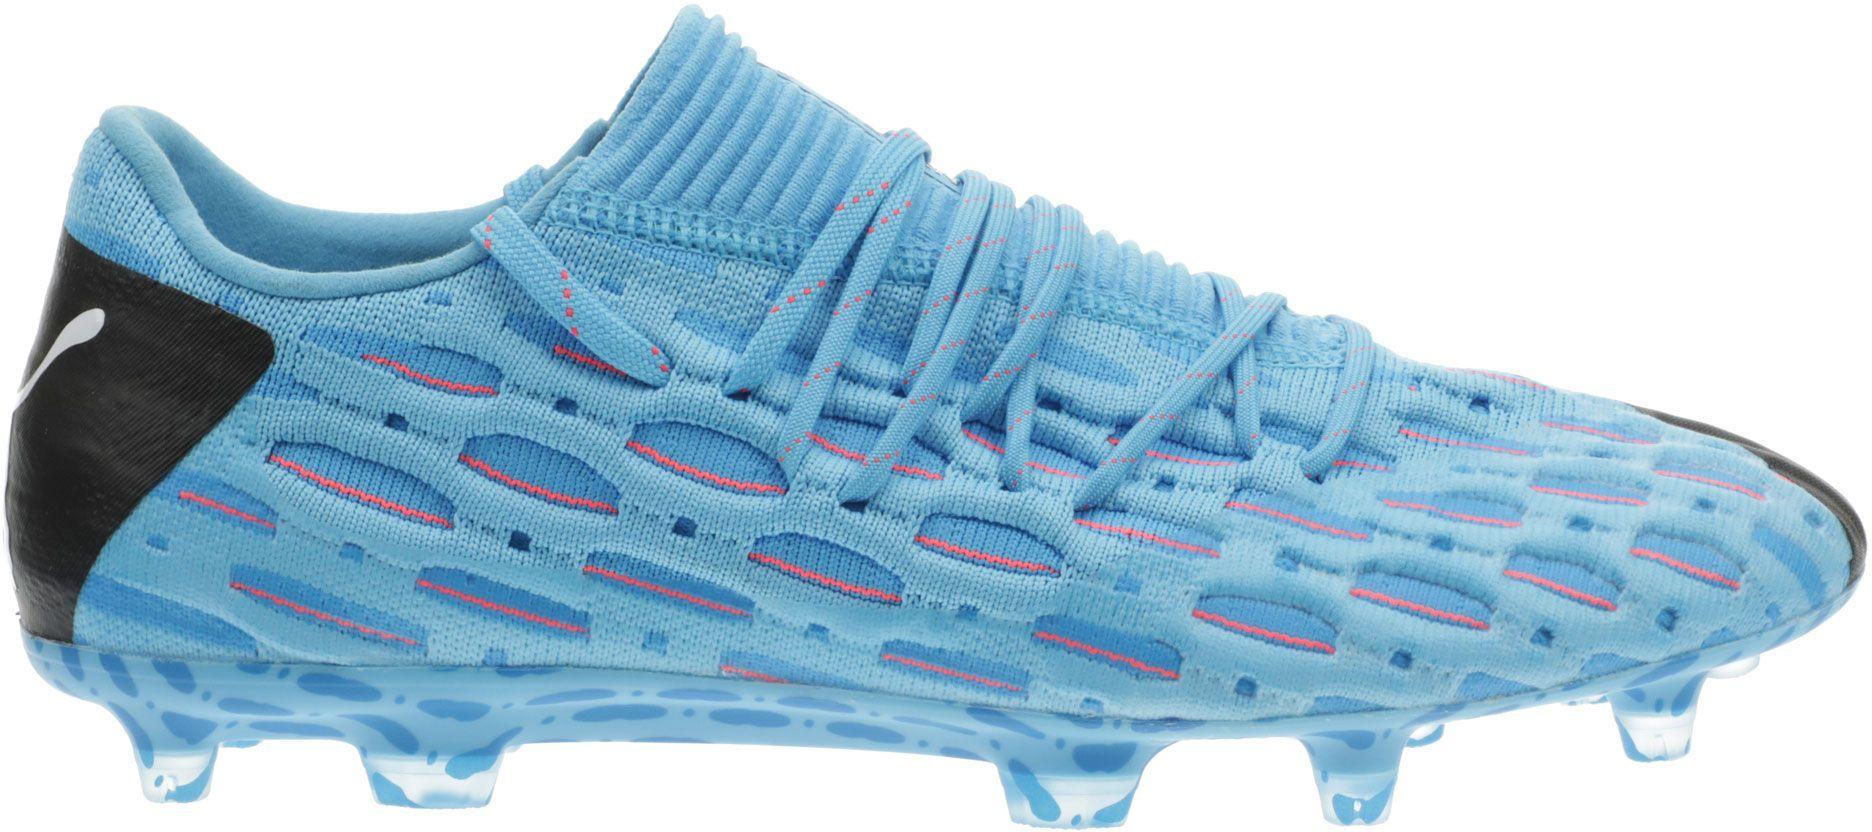 PUMA Men's Future 5.1 NetFit Low FG Soccer Cleats, Size: Small, Blue